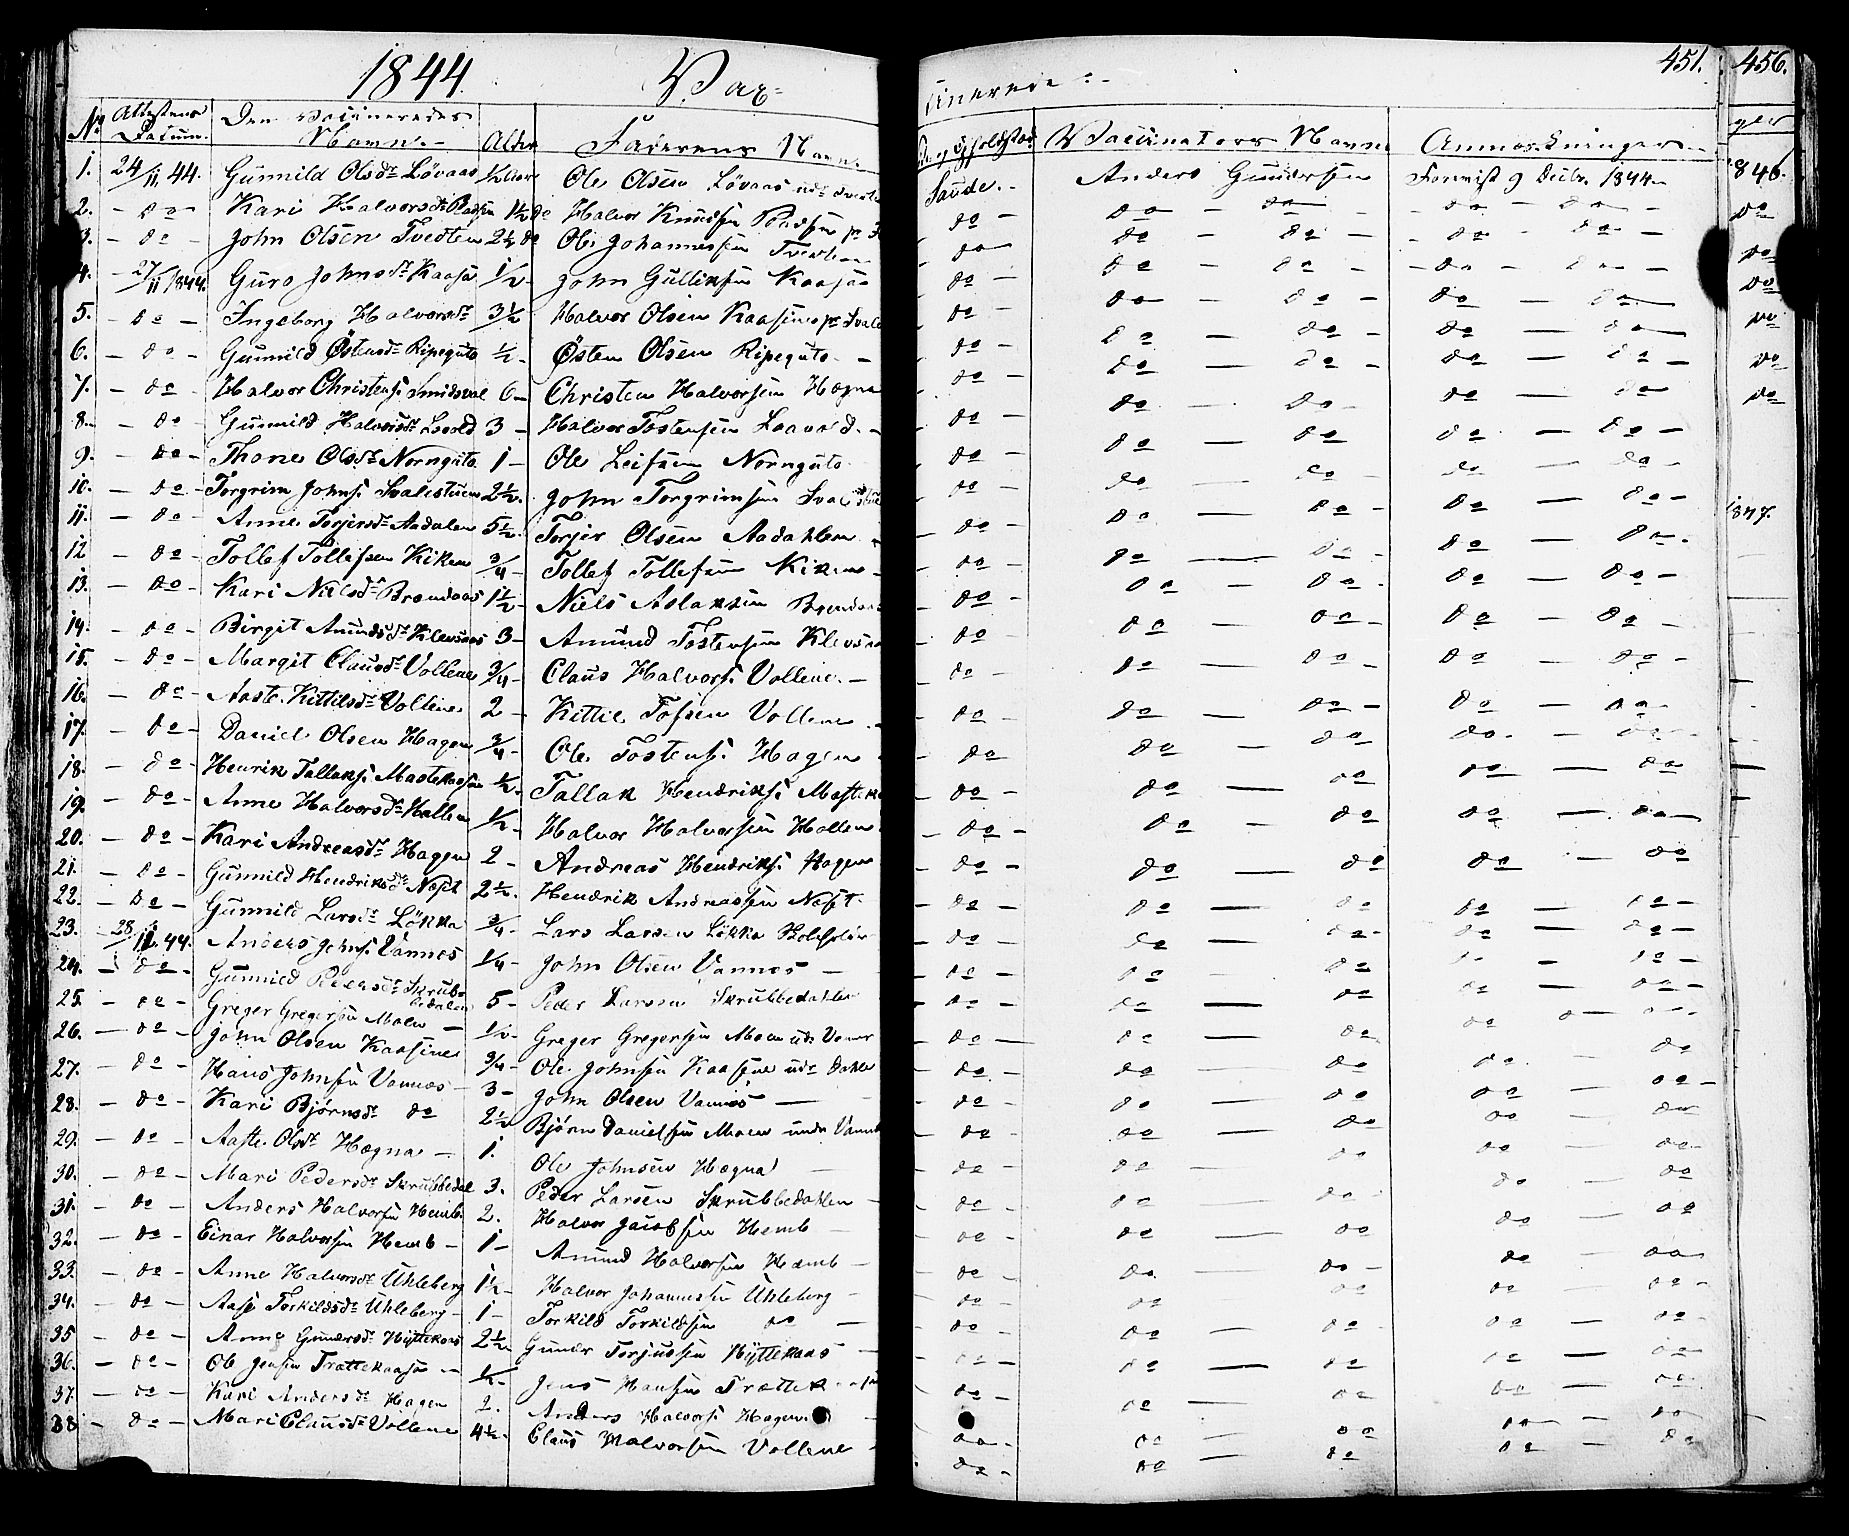 SAKO, Sauherad kirkebøker, F/Fa/L0006: Ministerialbok nr. I 6, 1827-1850, s. 451